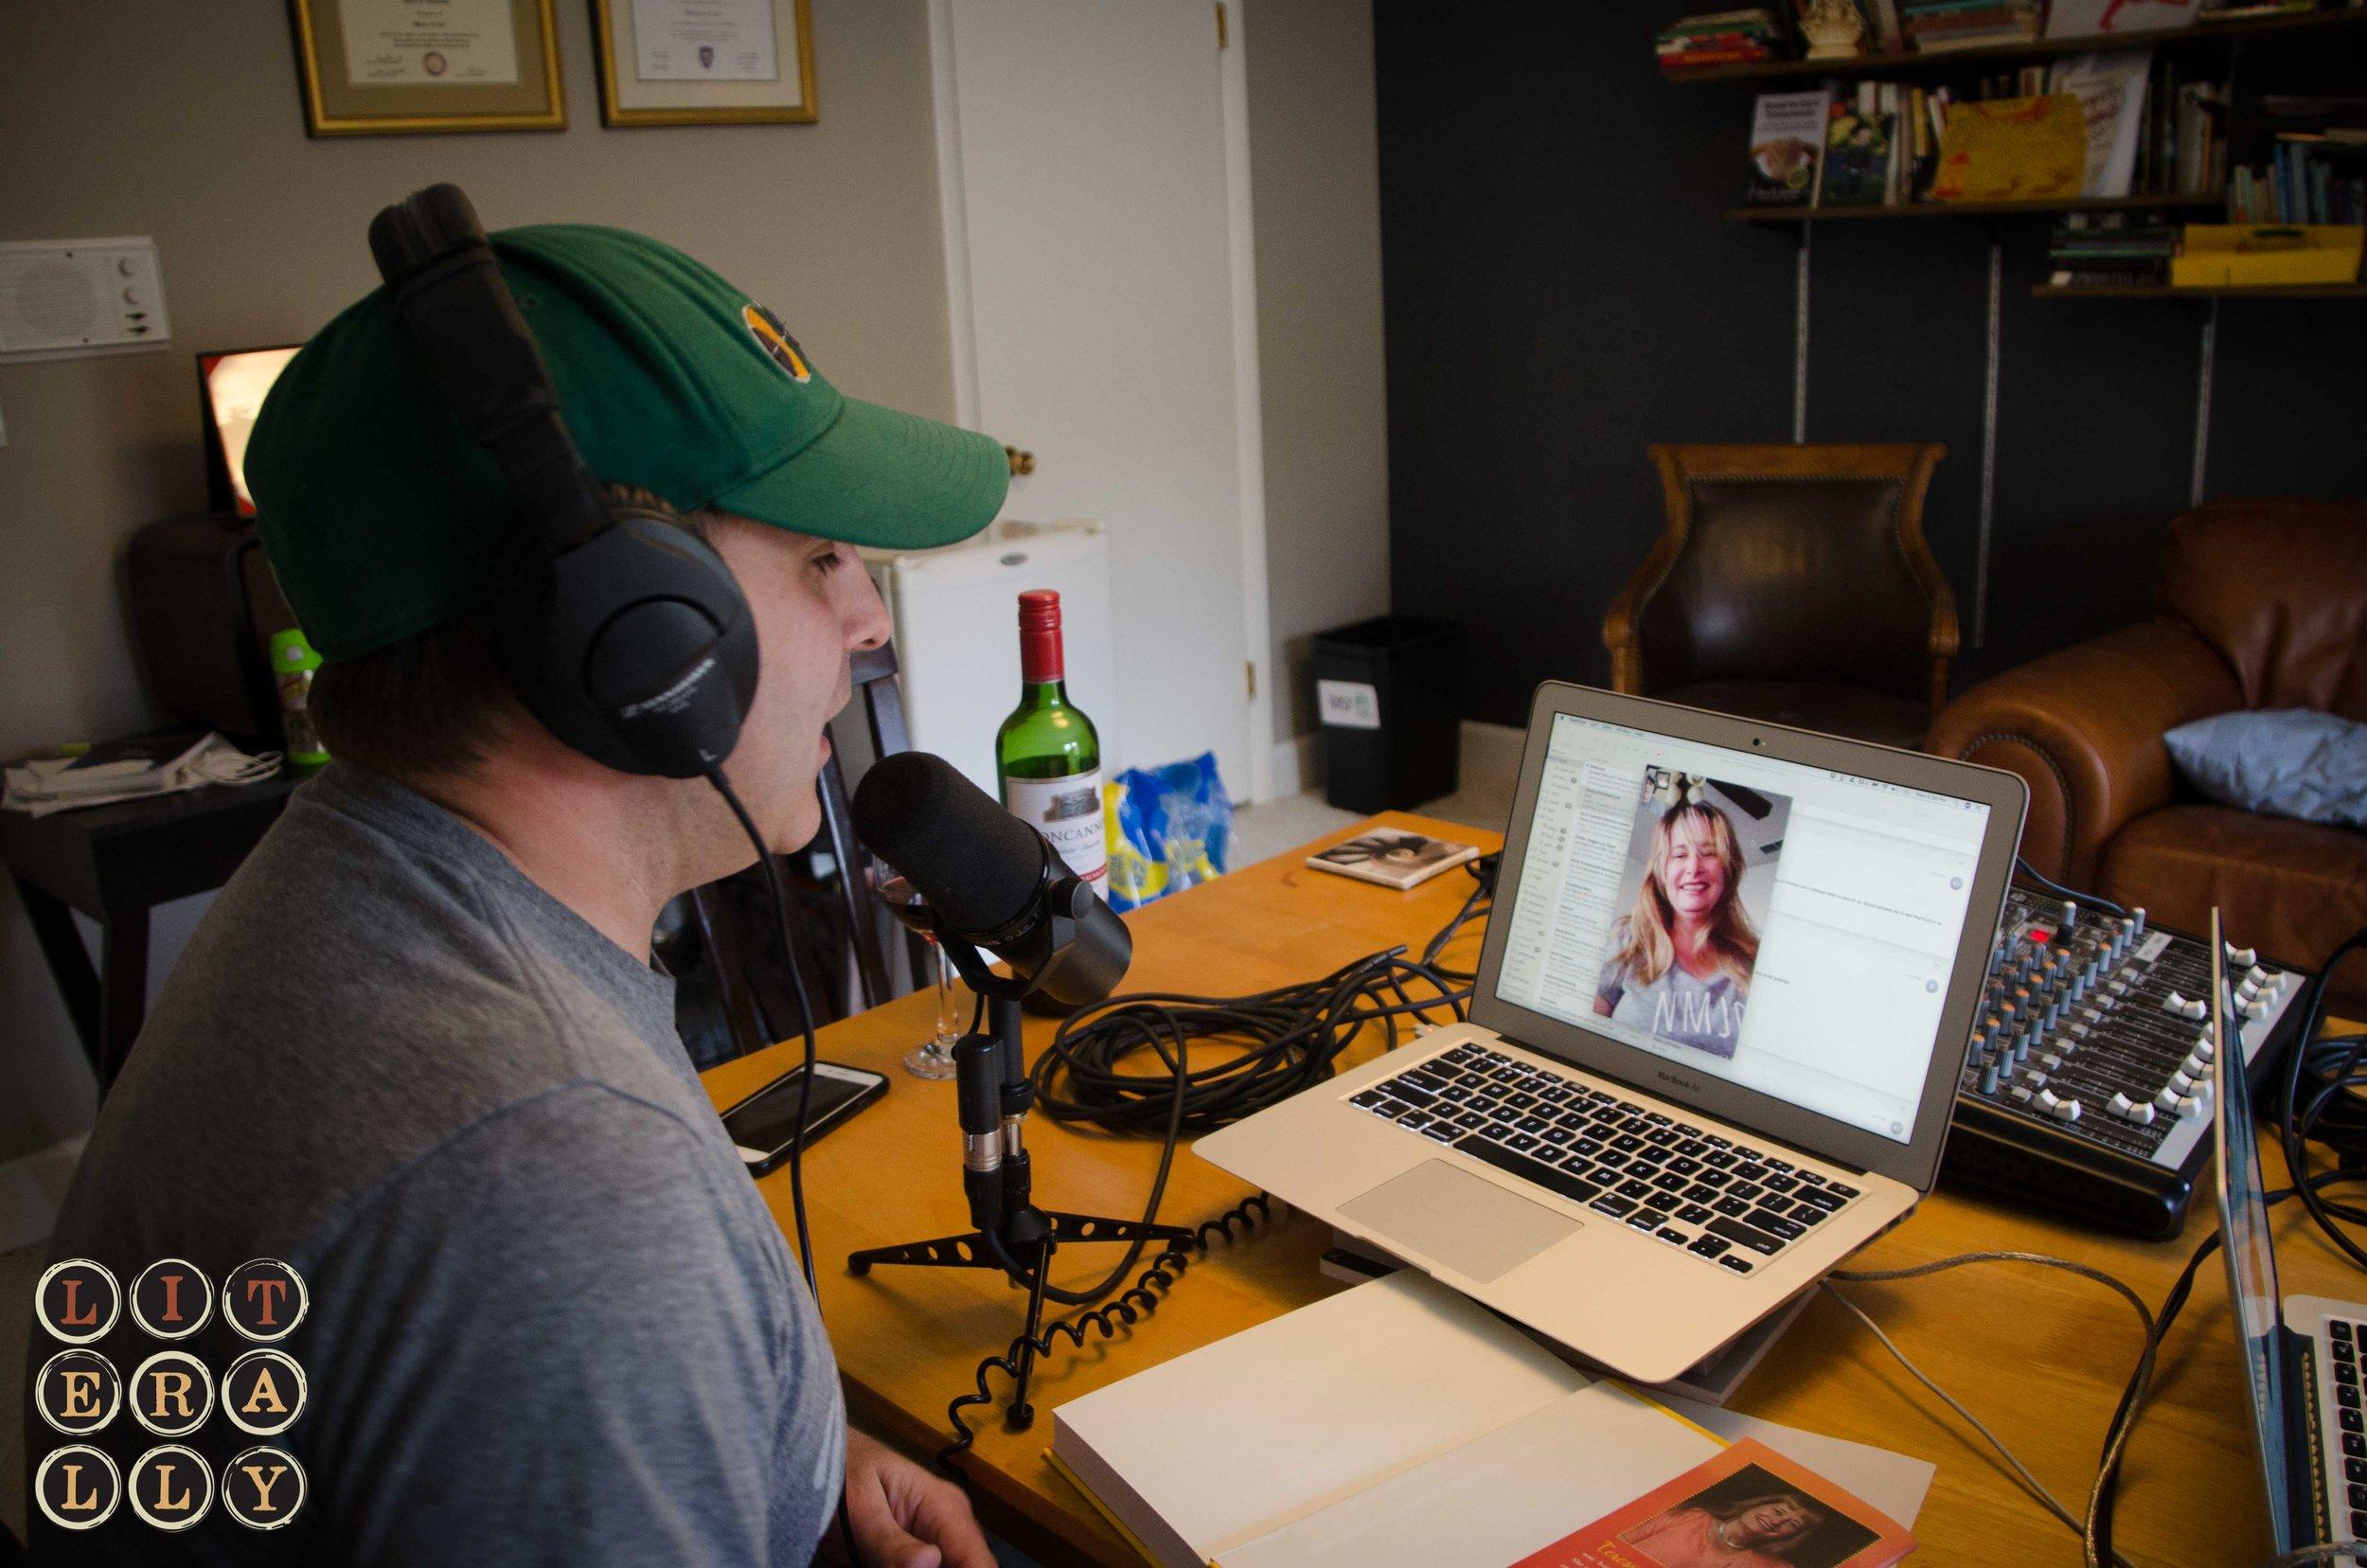 Host Kase Johnstun interviewing guest author, Teresa Dovalpage.